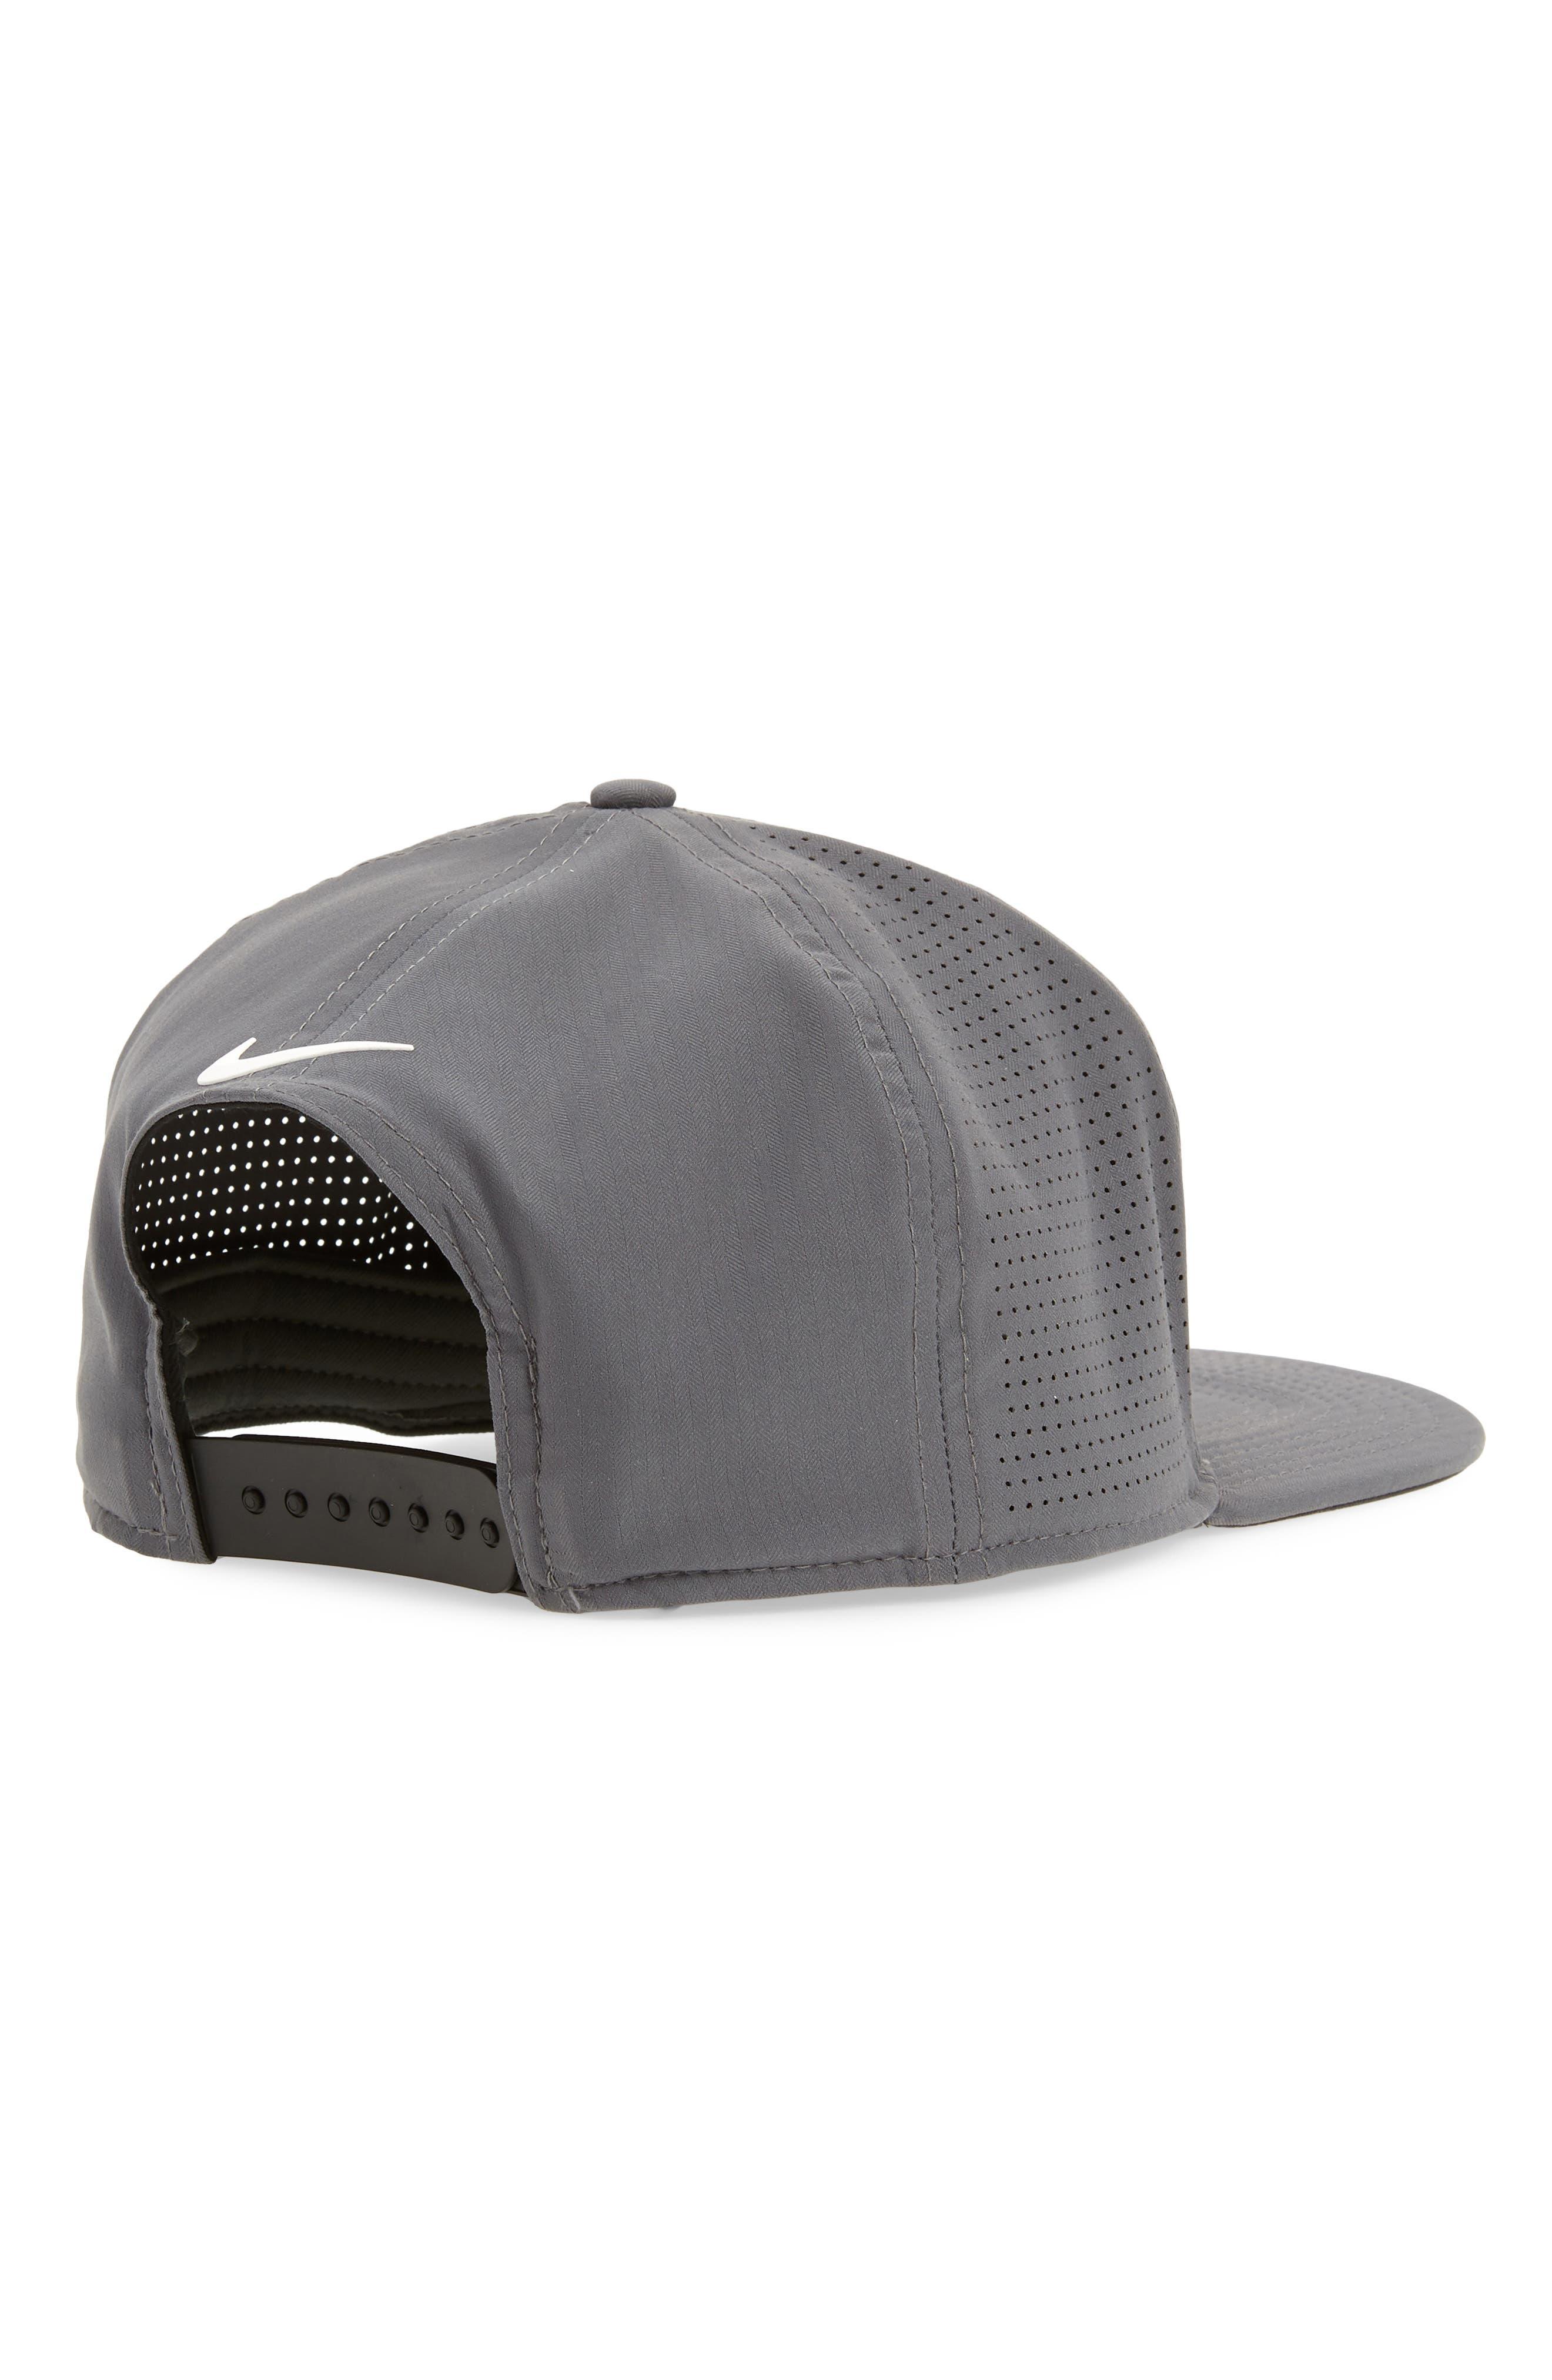 AeroBill Dry Golf Hat,                             Alternate thumbnail 2, color,                             021